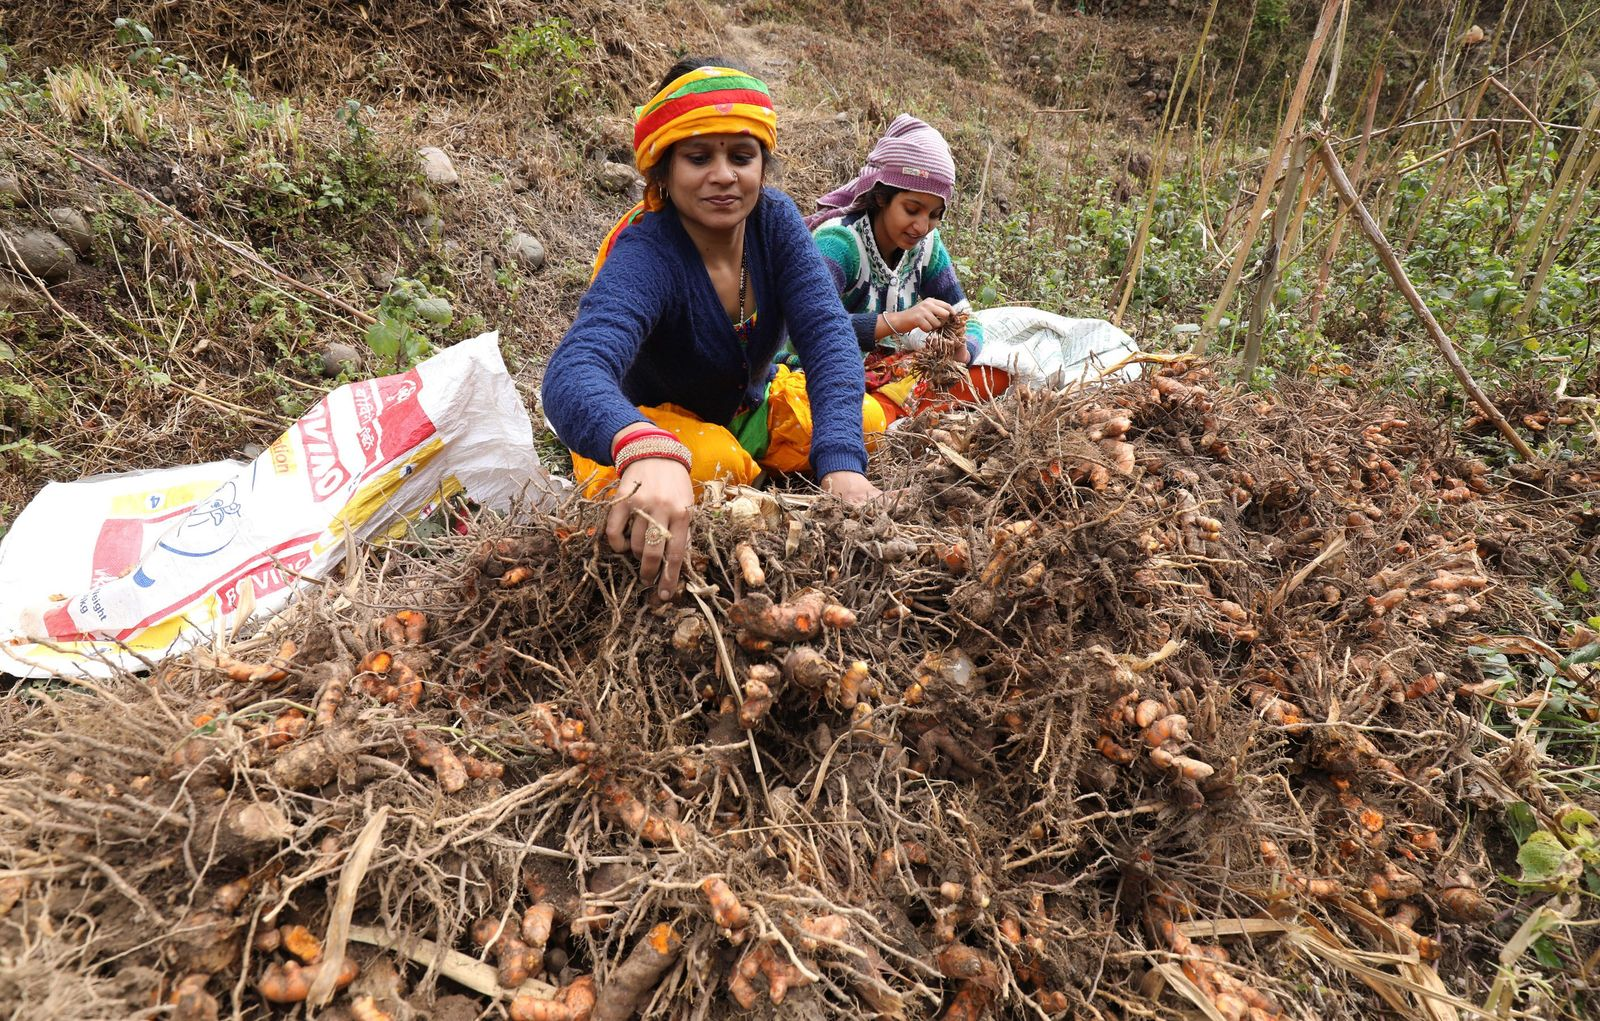 Turmeric harvest near Dharamsala, India, Jalot - 26 Nov 2020